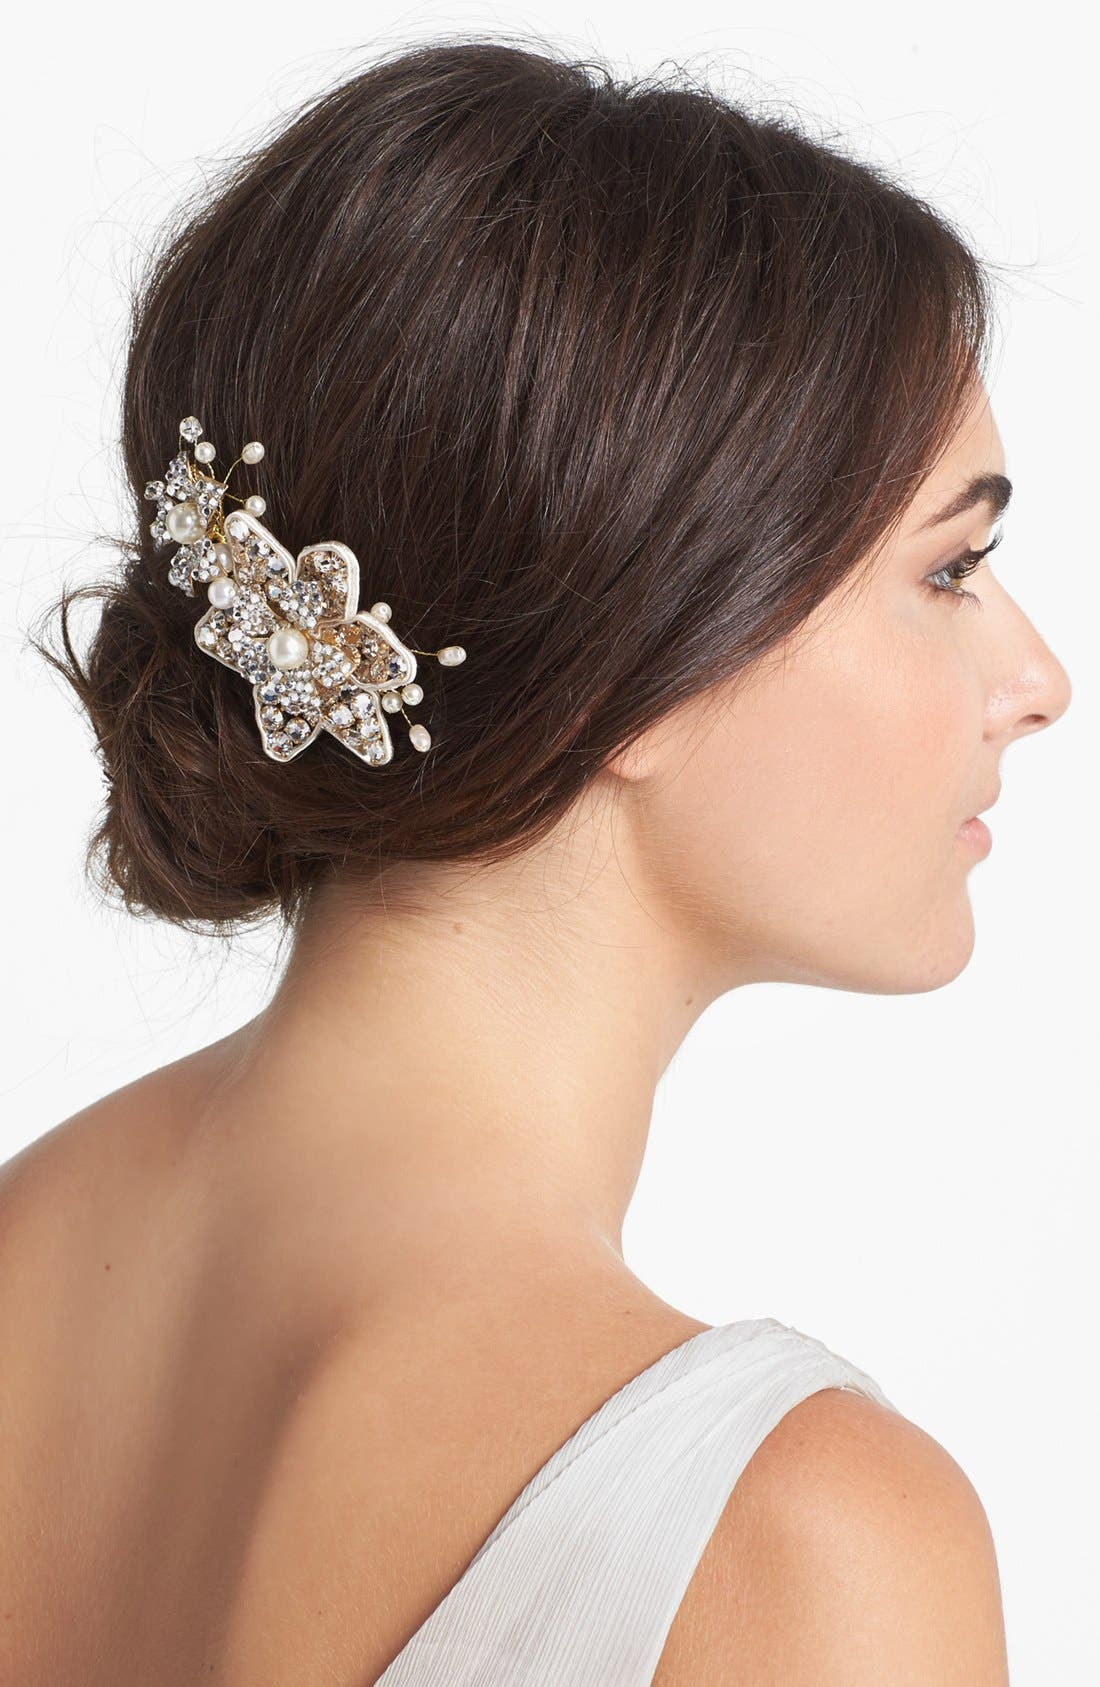 Main Image - Halo & Co 'Ferrara' Crystal Flower Comb